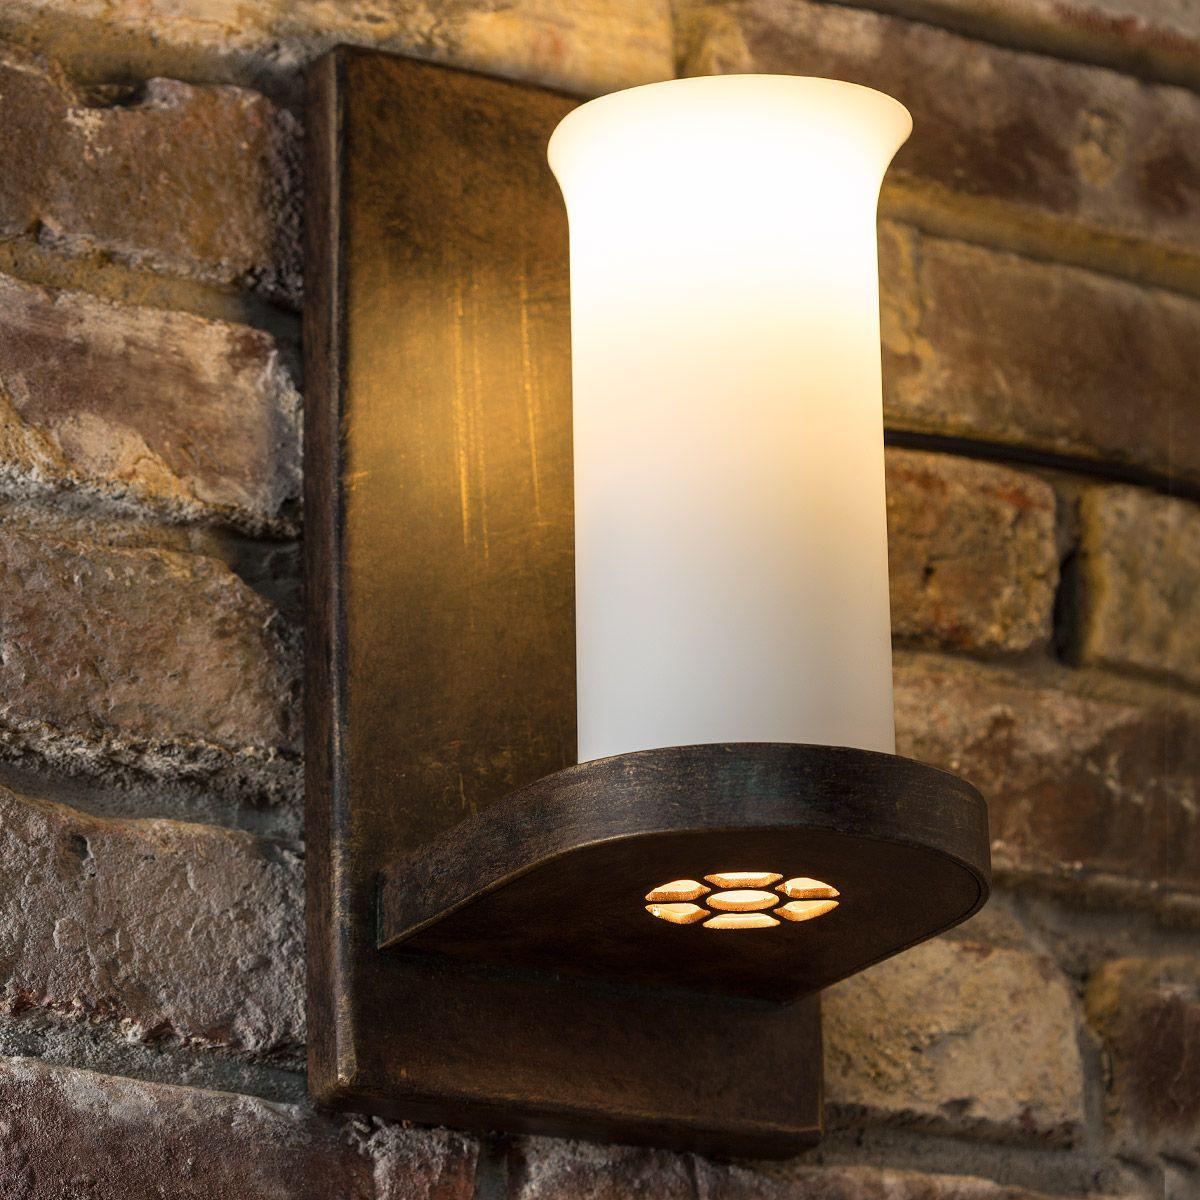 Robers Leuchten schmiedeeiserne kerzen wandleuchte wl 3484 robers leuchten